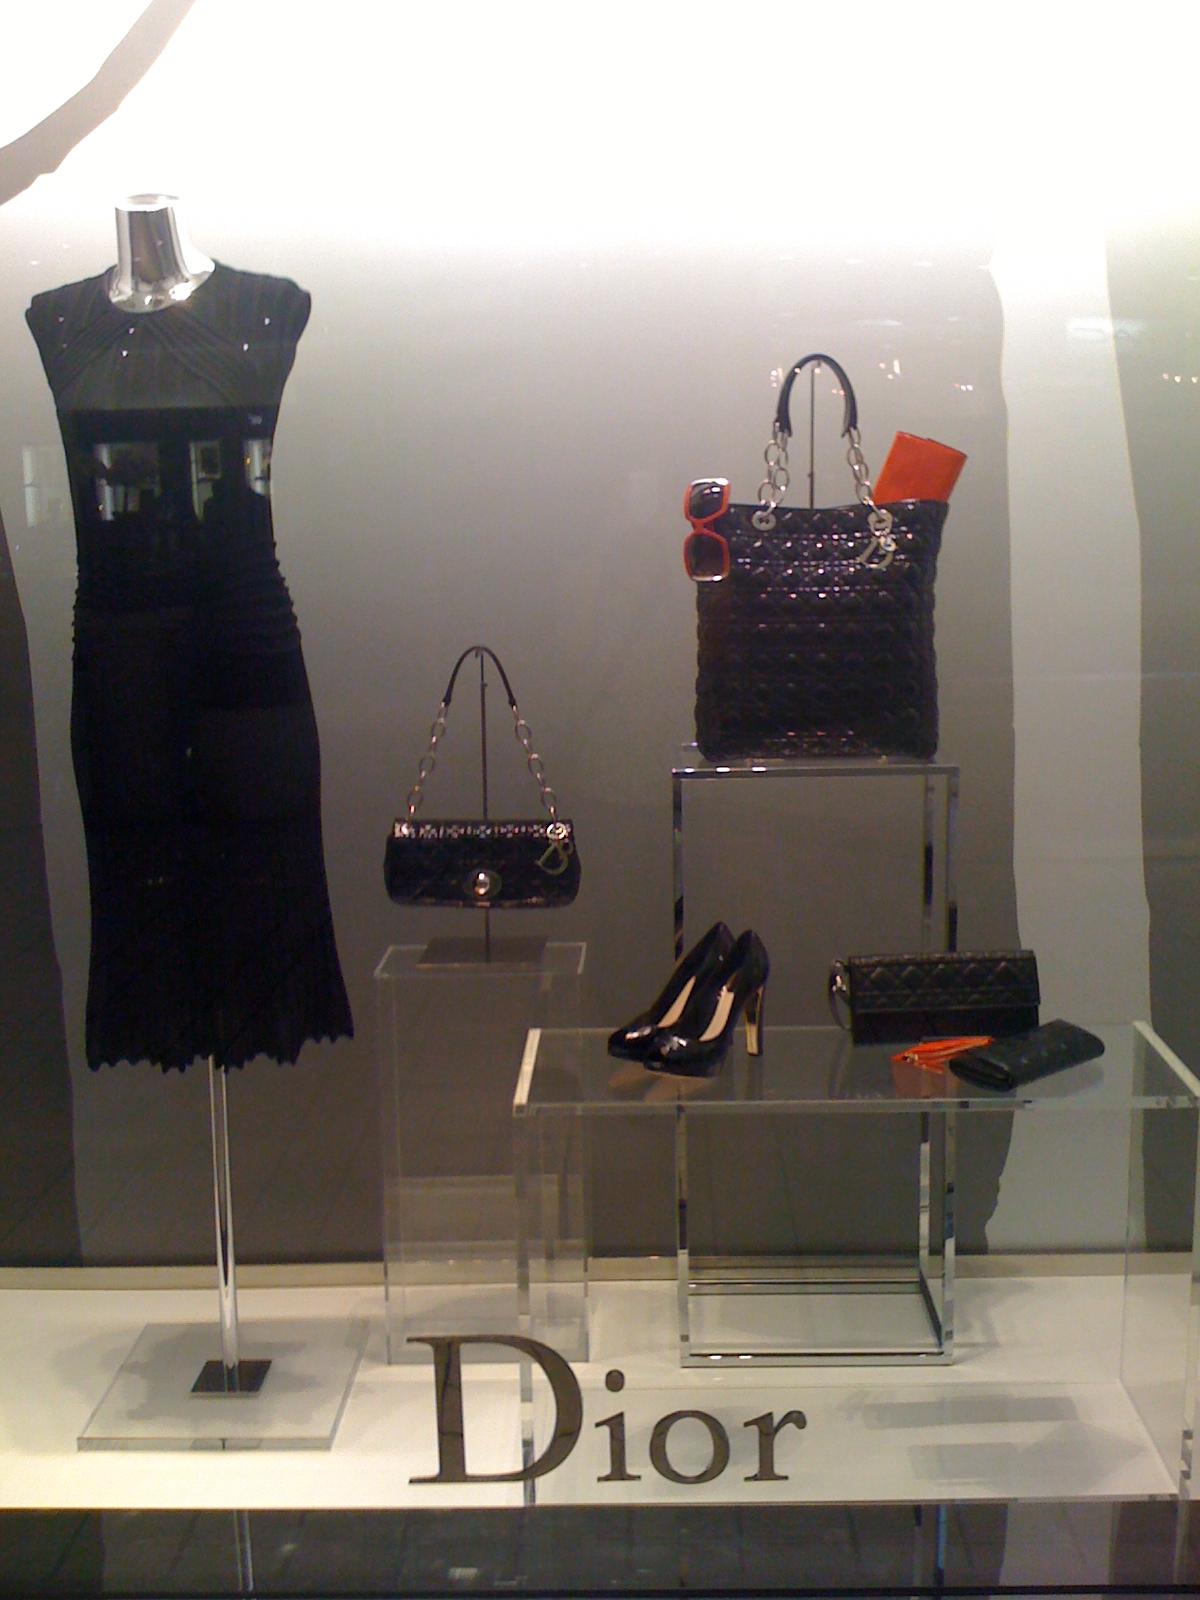 Dior always looks amazing and ladylike!